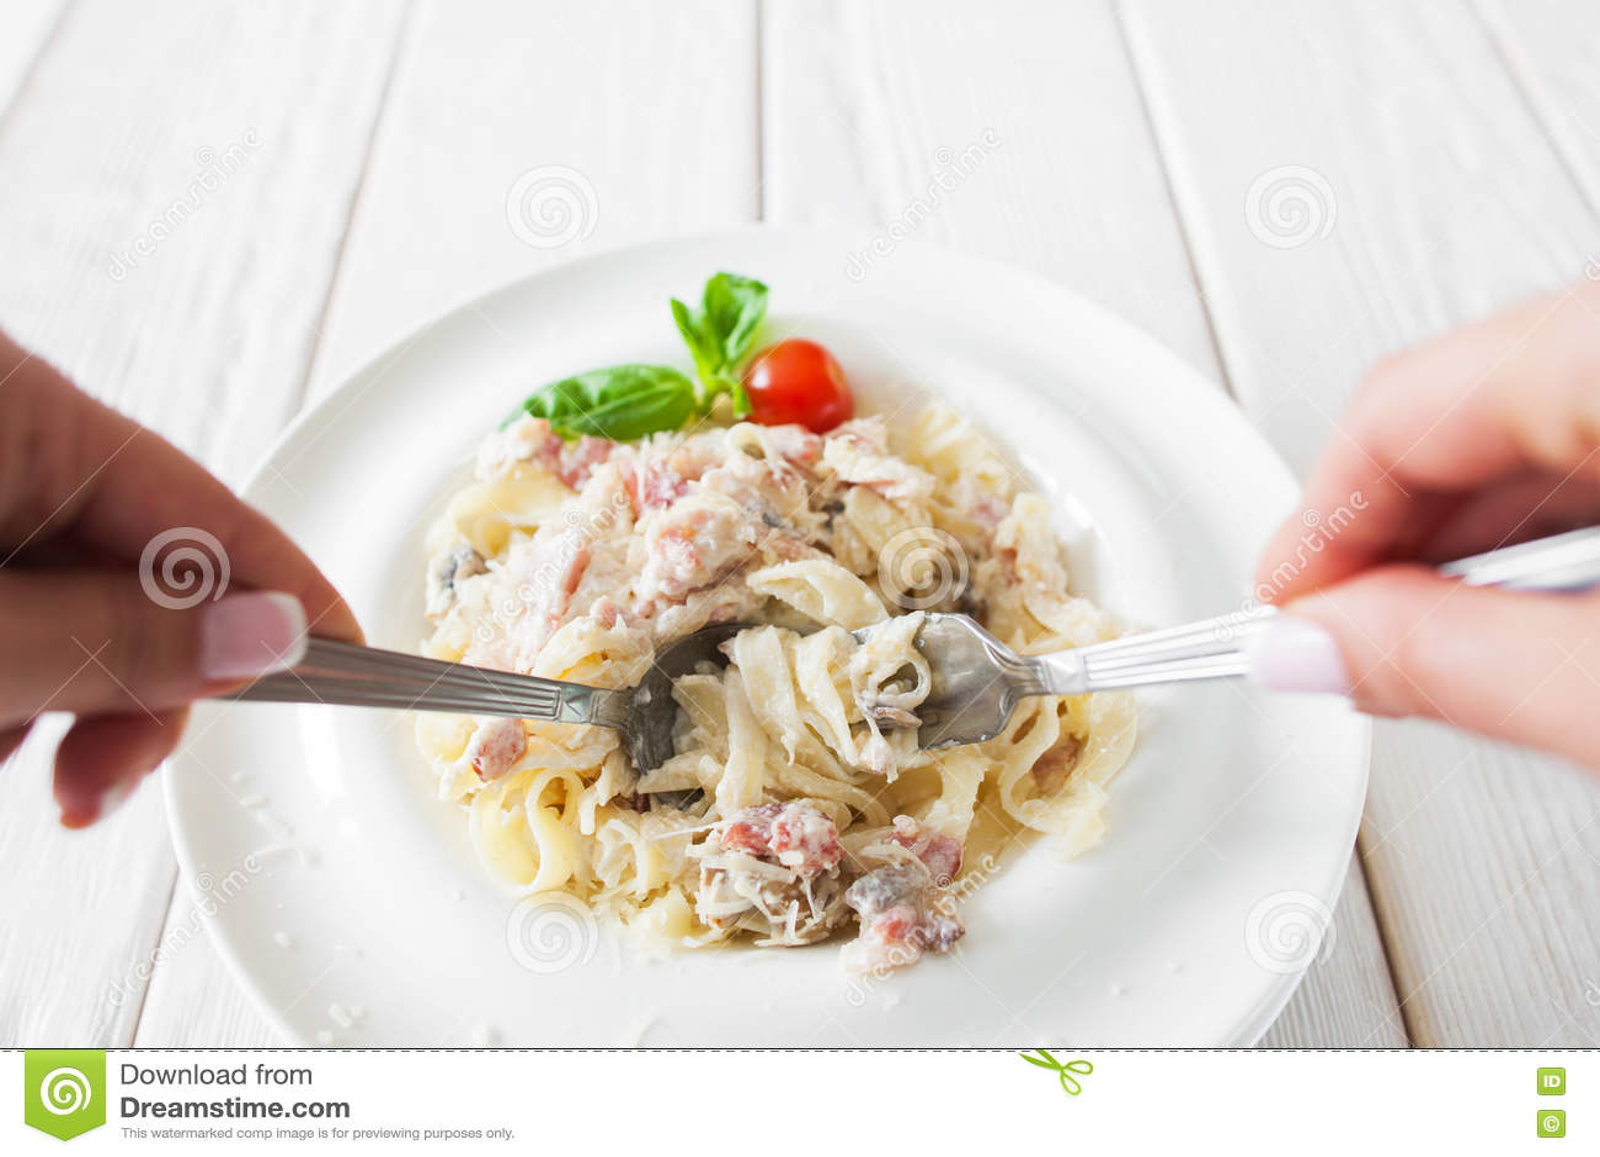 Traditional eating of pasta carbonara, eater pov